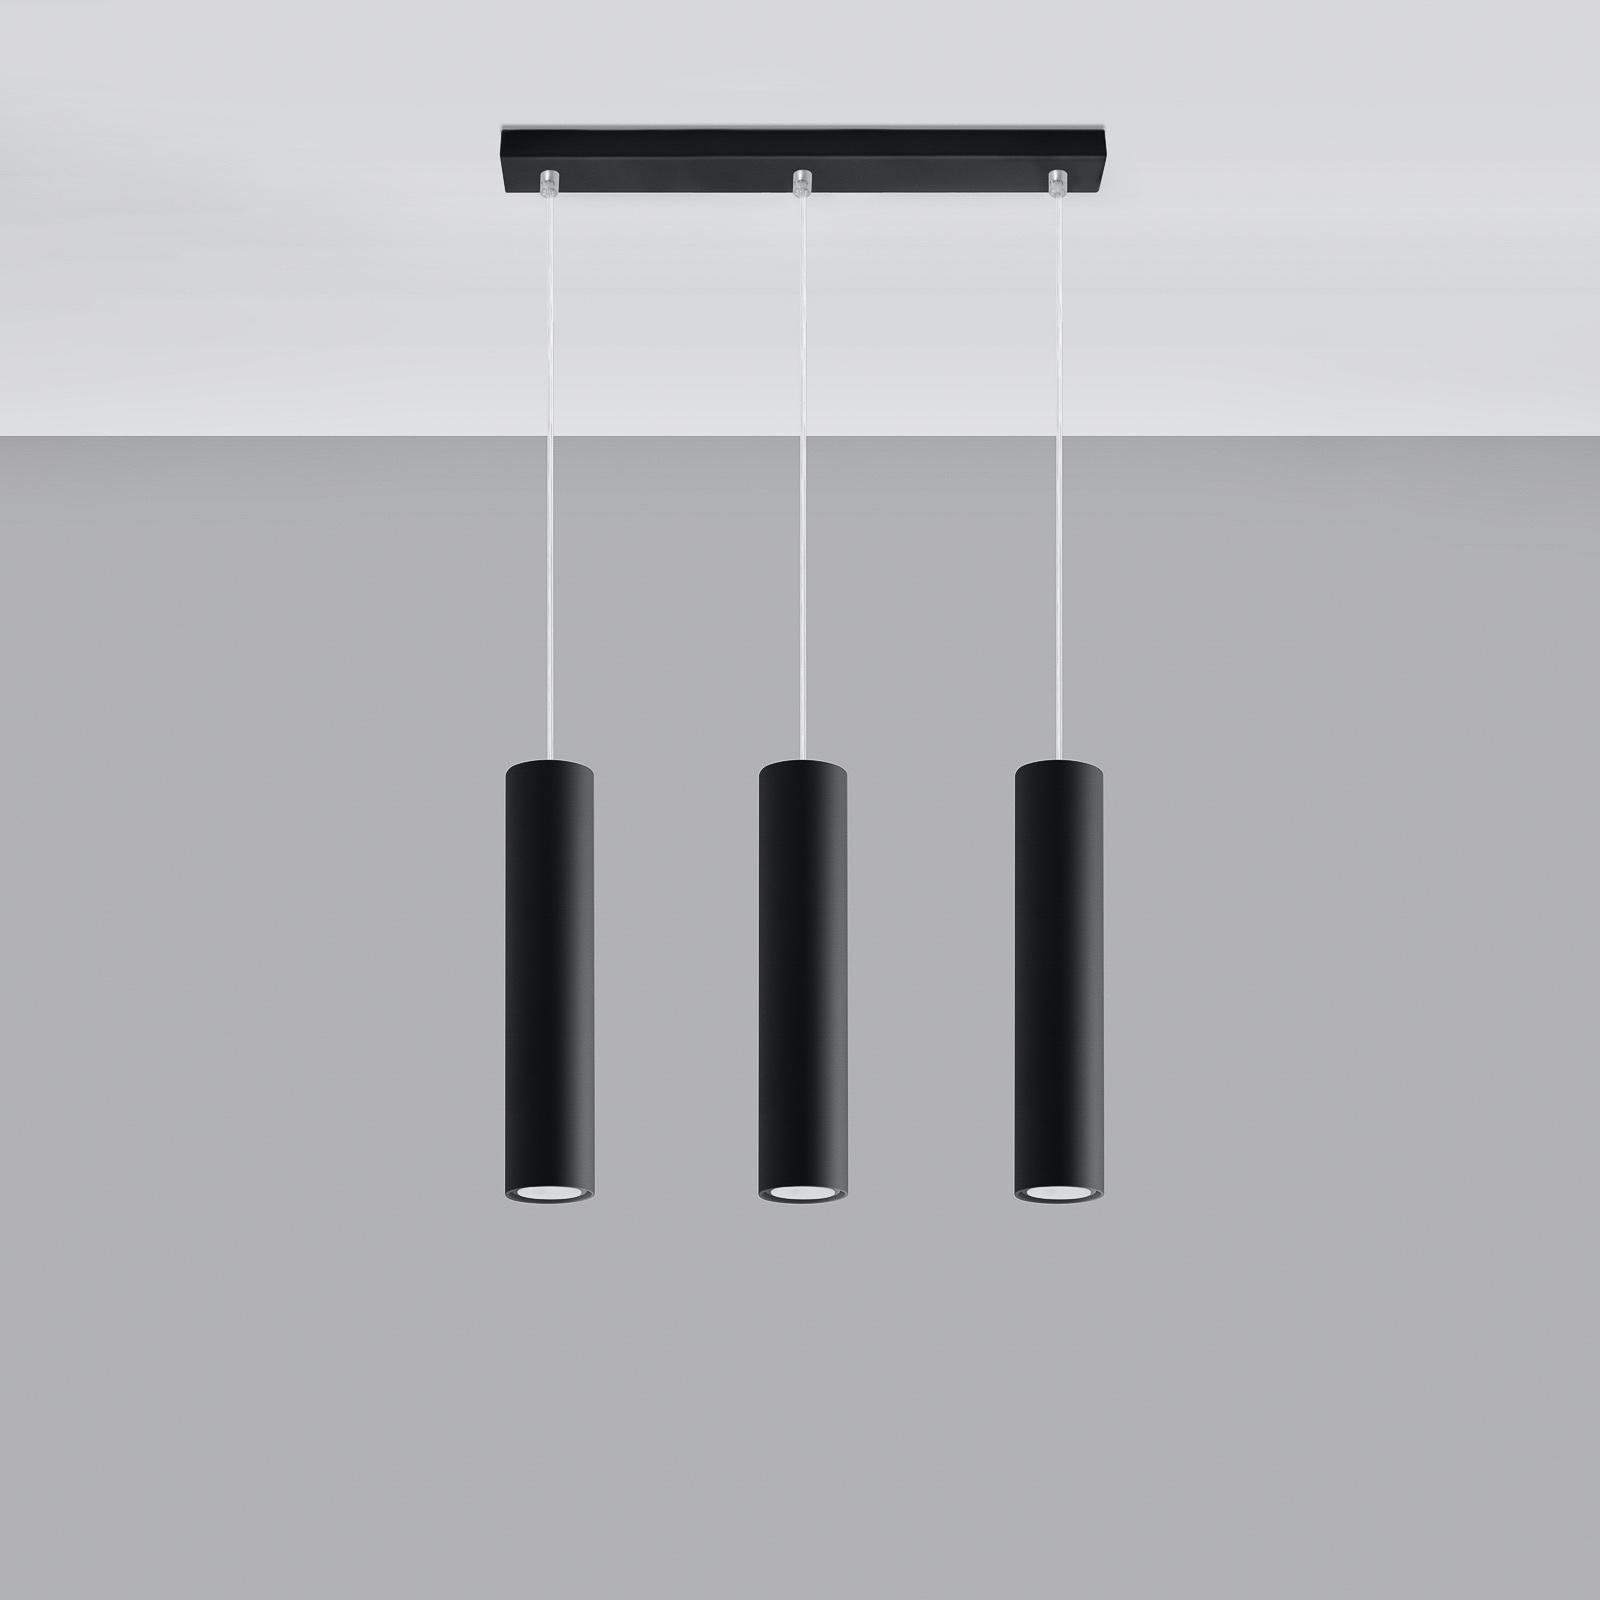 Lampa wisząca Tube, czarna, 3-punktowa